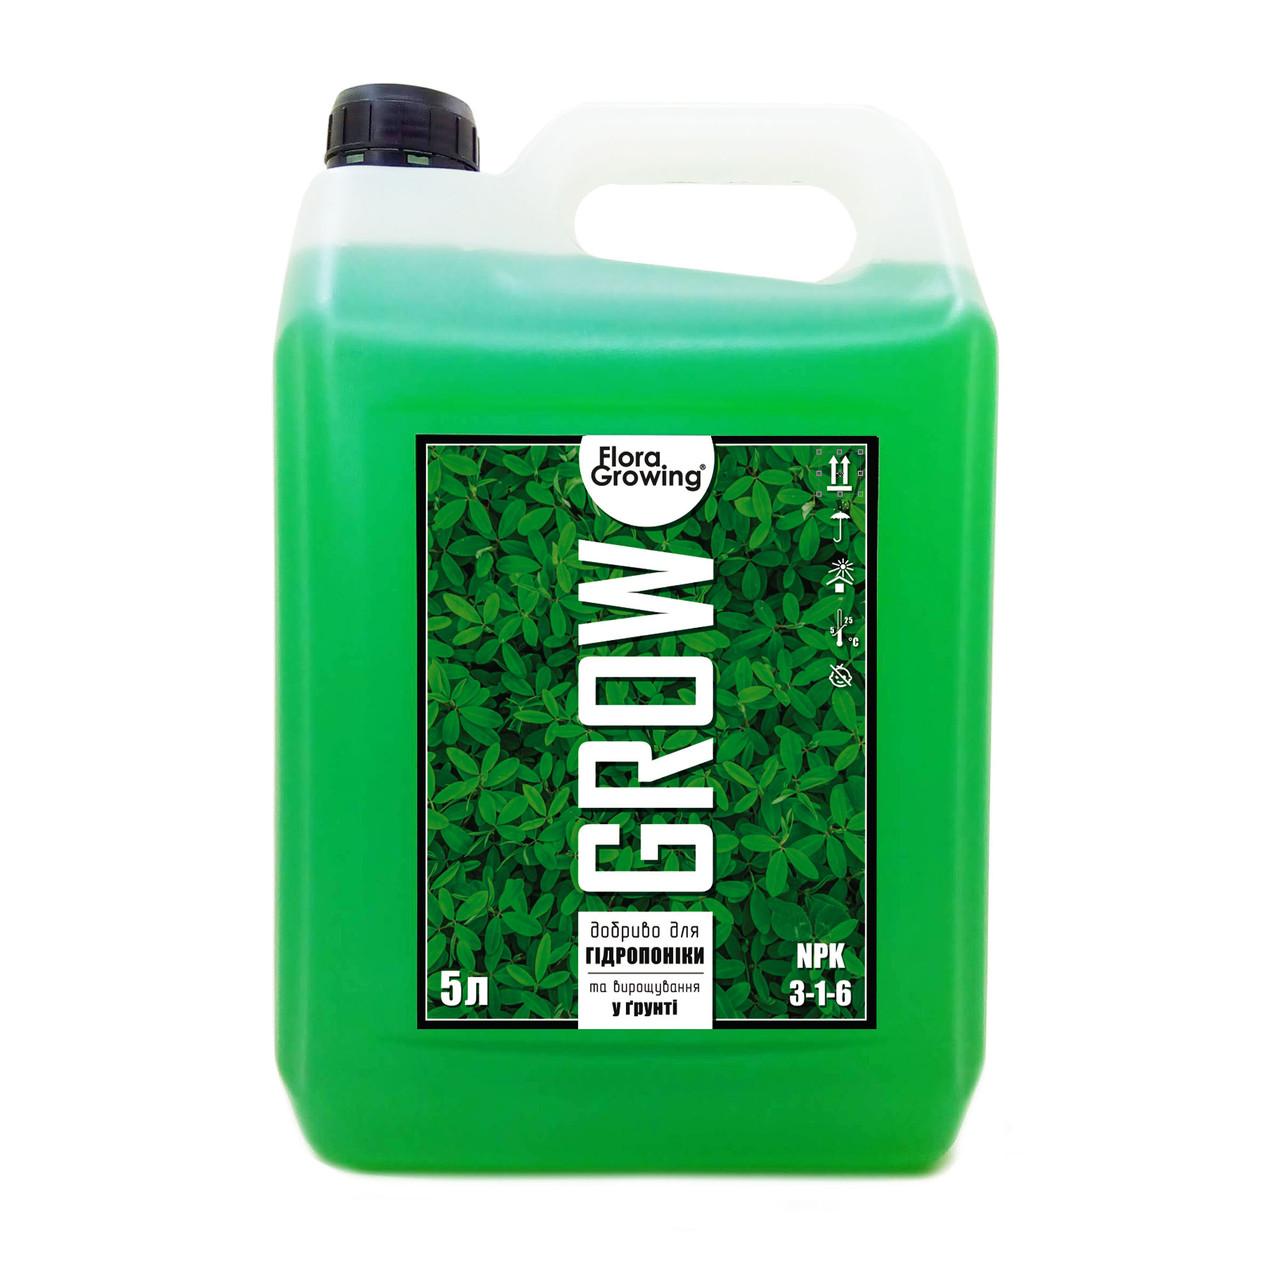 5 л Grow - компонент удобрений для гидропоники и почвы аналог GHE